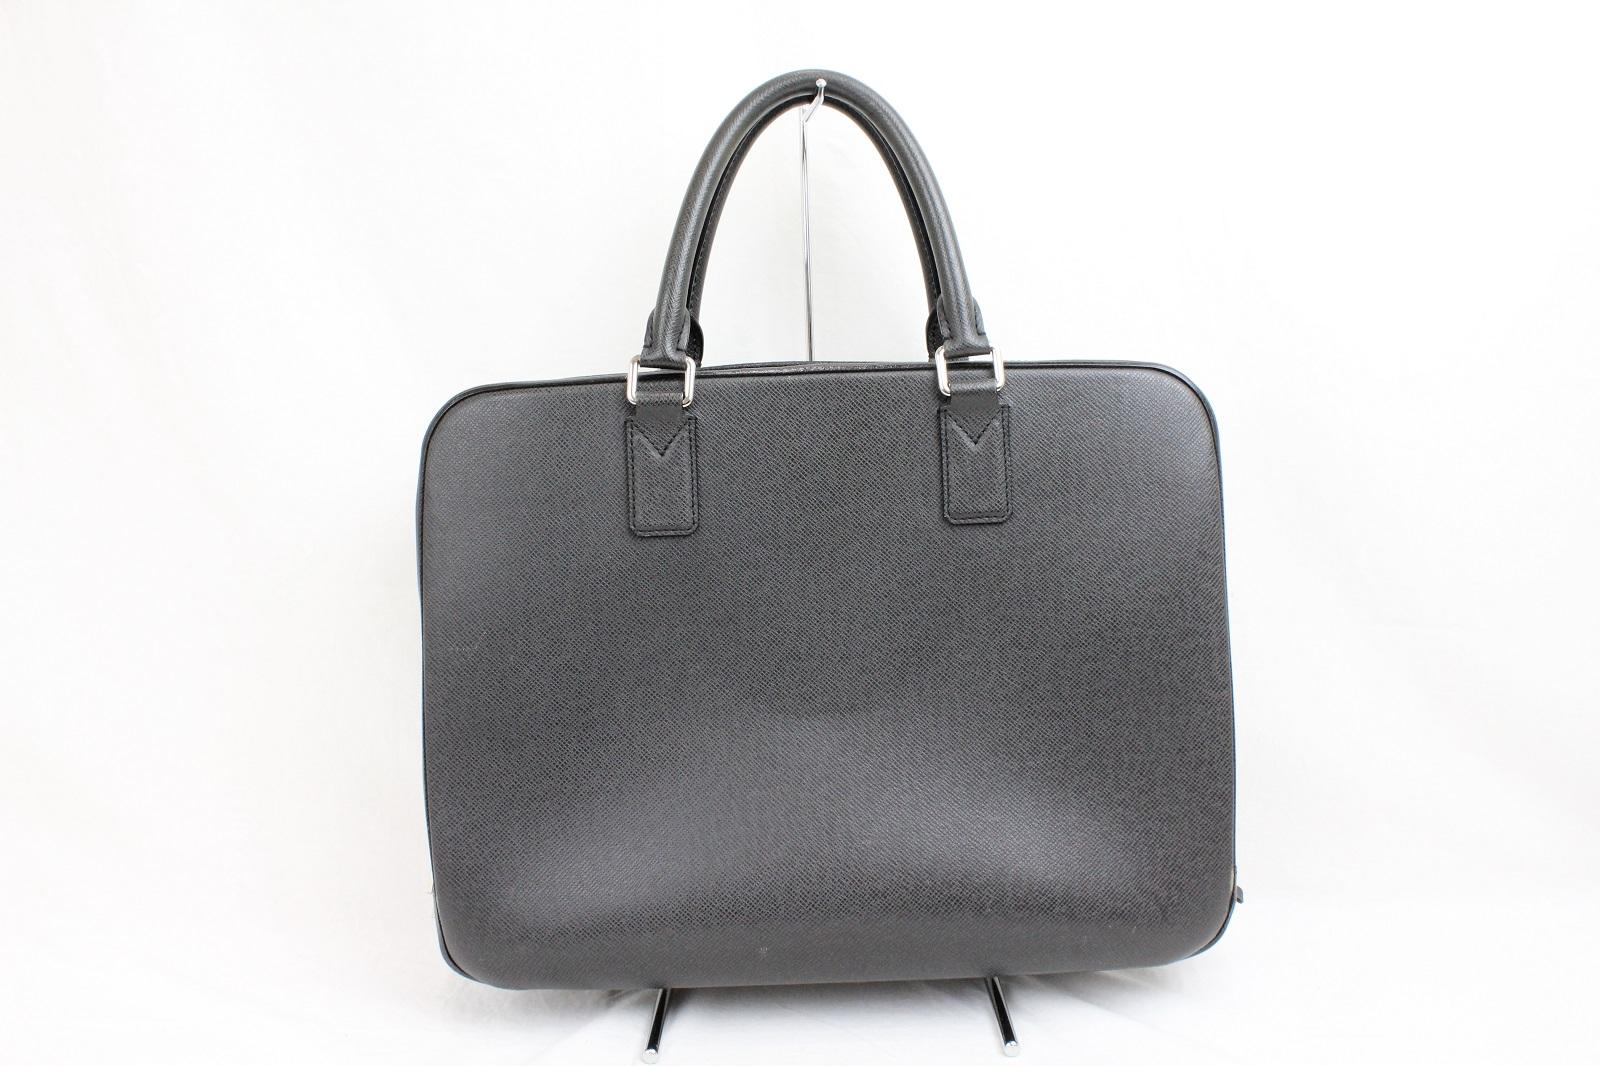 LOUIS VUITTON ルイヴィトンネオ・イゴール M32782ハンドバッグ タイガラインシンプル メンズプレゼント包装可 【中古】